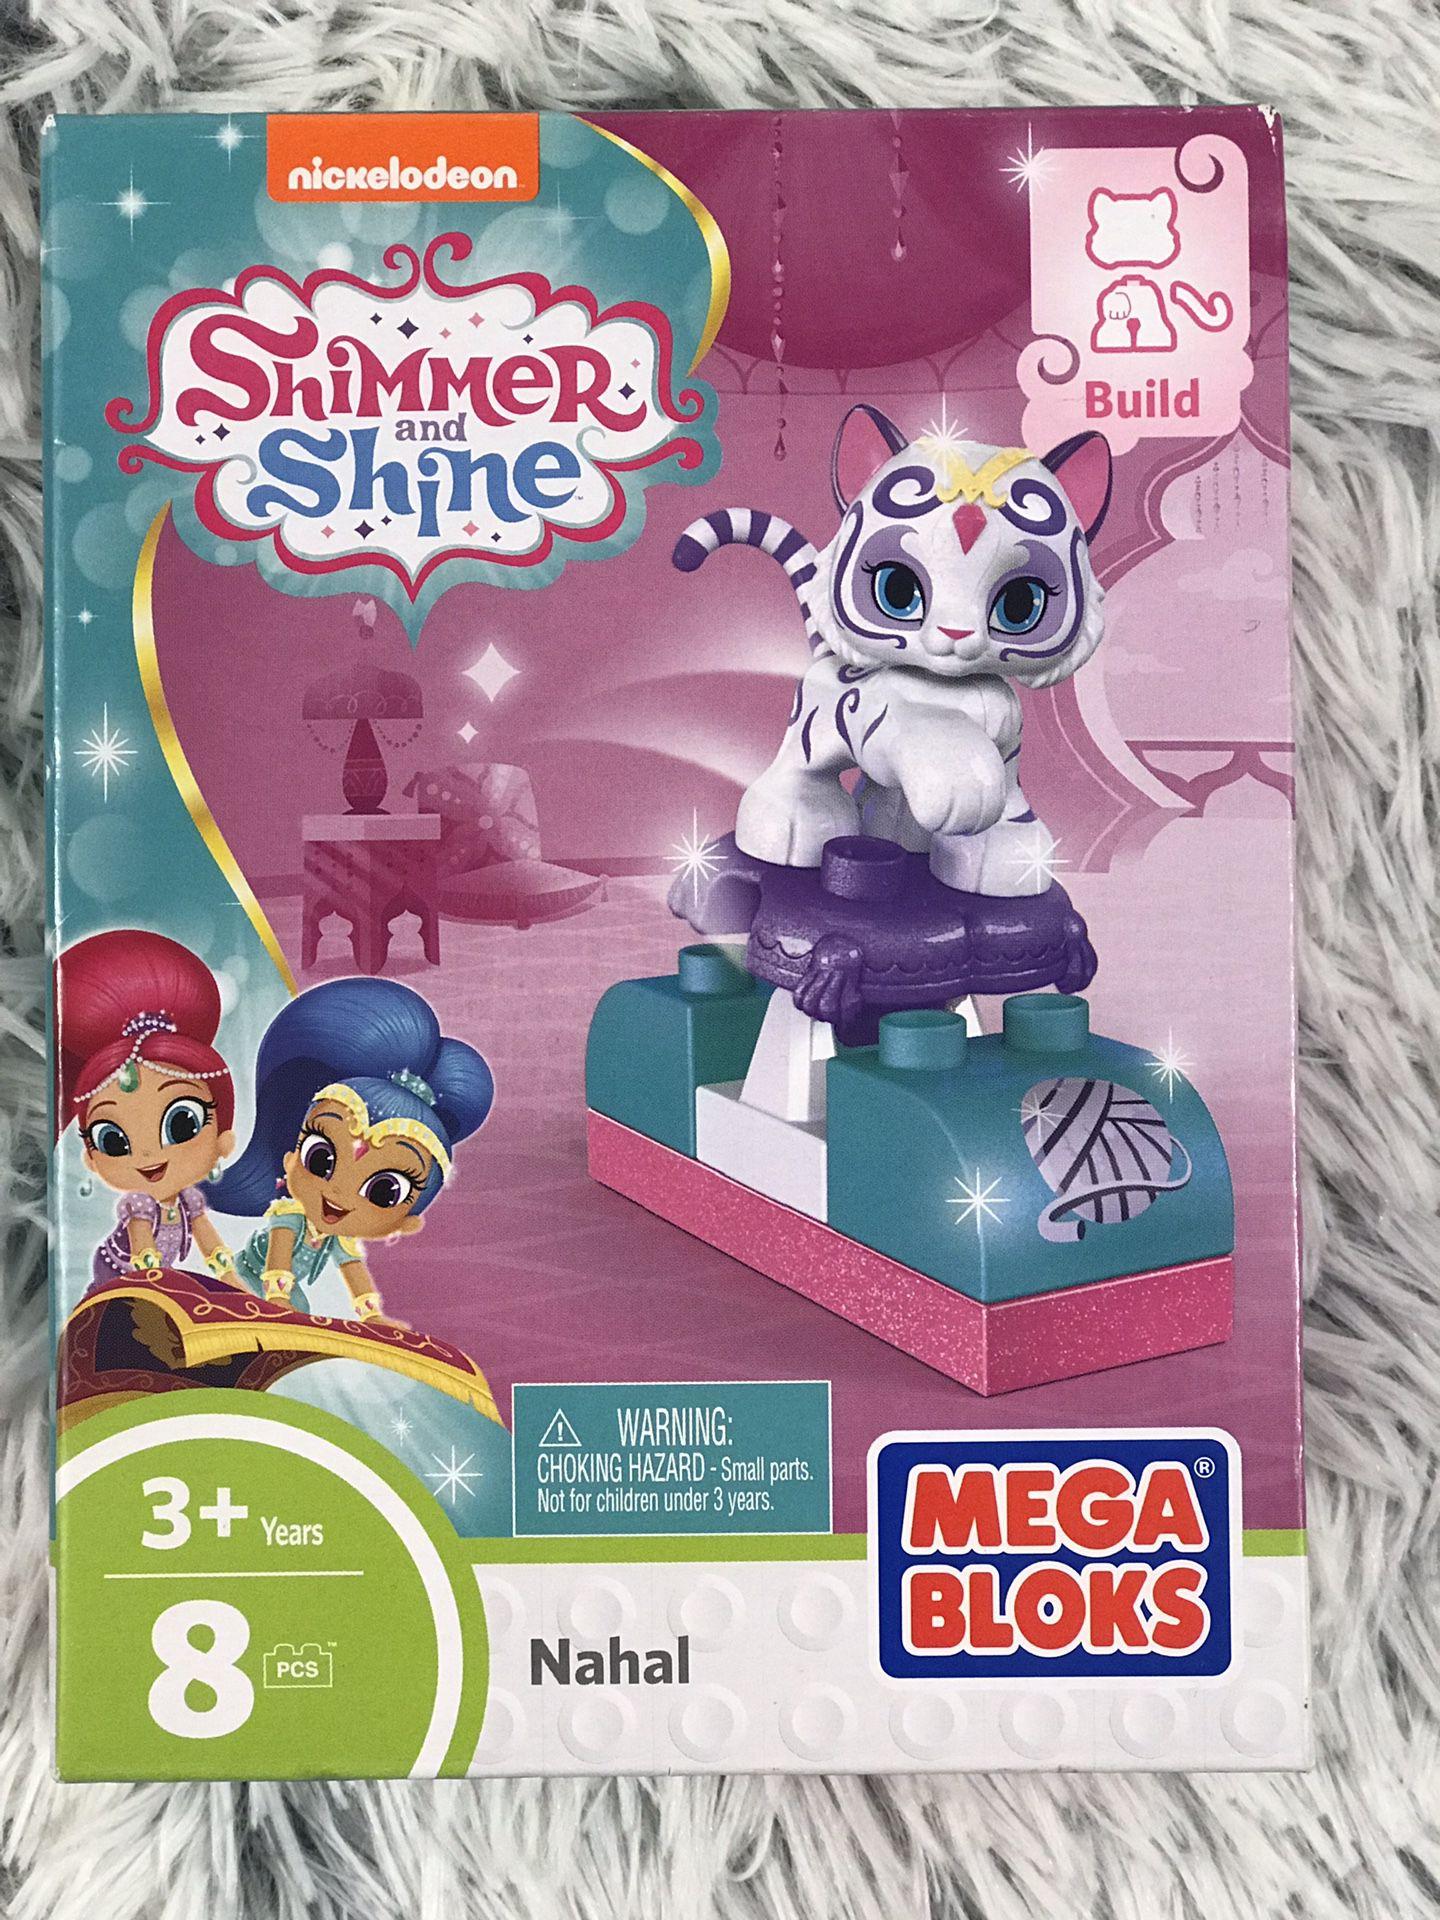 Shimmer and Shine LEGO set